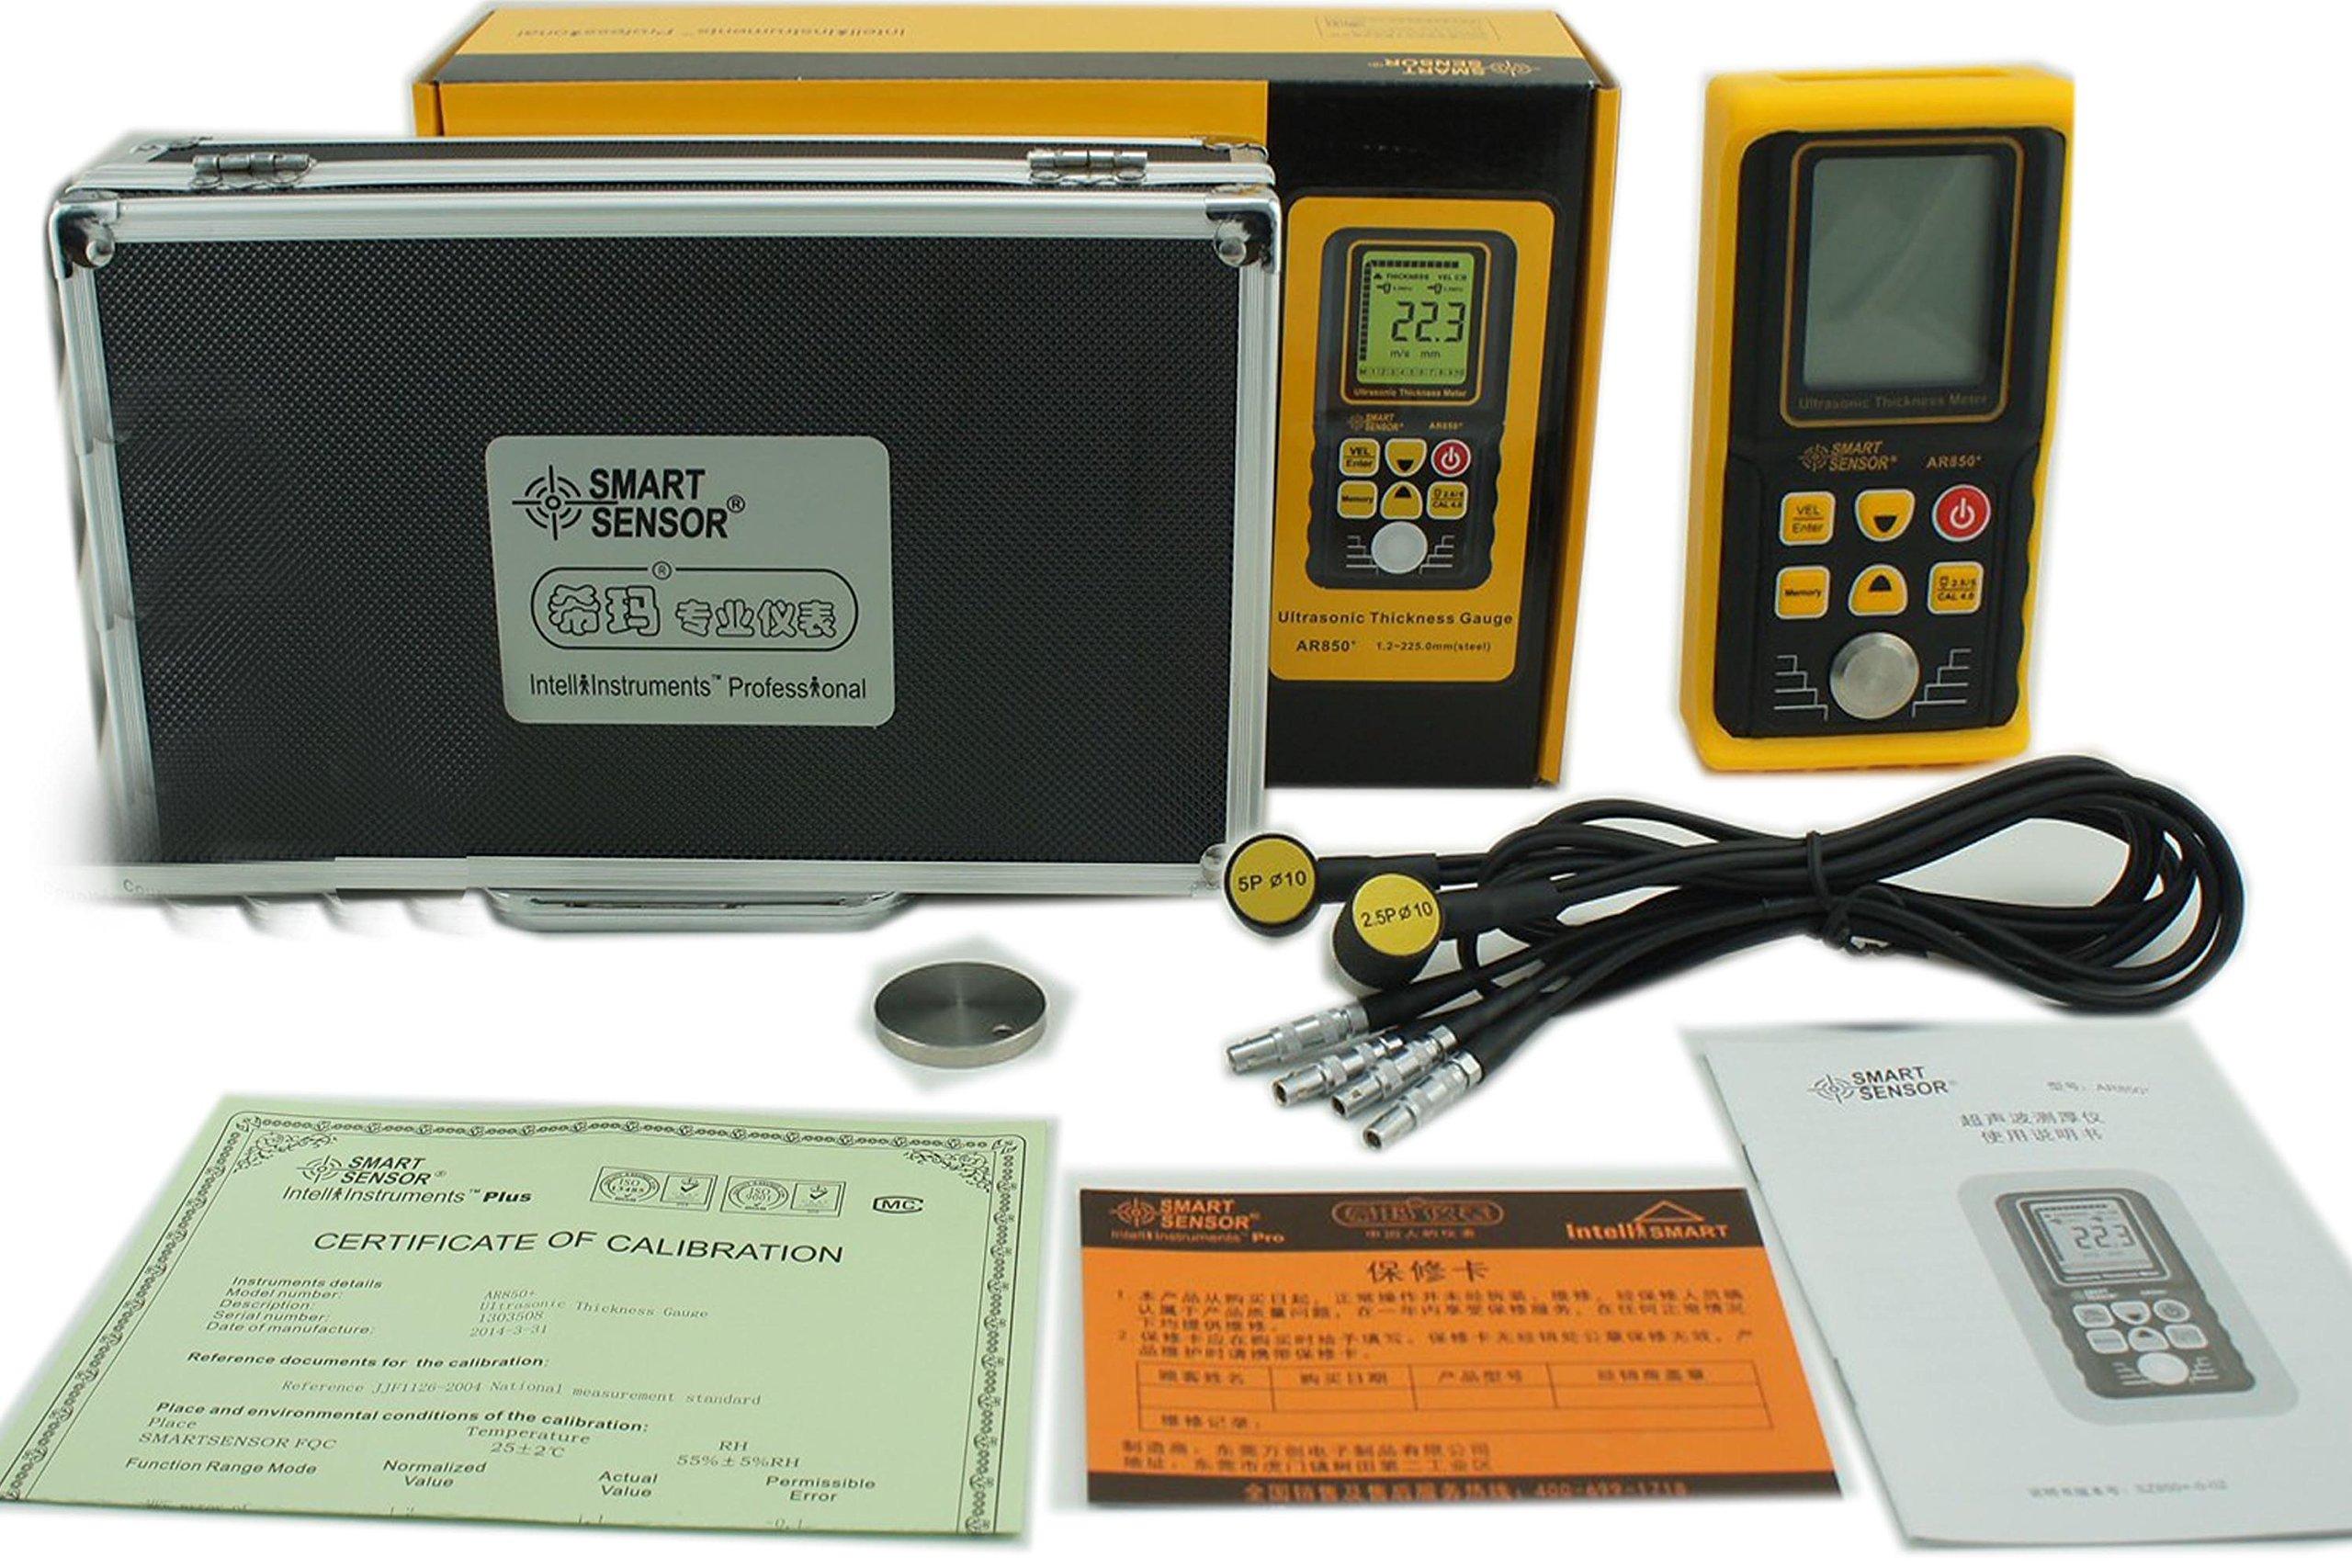 VETUS INSTRUMENTS AR850+ Portable Digital Ultrasonic Thickness Meter Tester Gauge Range 1.20 to 225.0 mm(Steel) Sound Velocity 1000 to 9999m/s For Metal Plastic ceramic glass glass fiber Tester